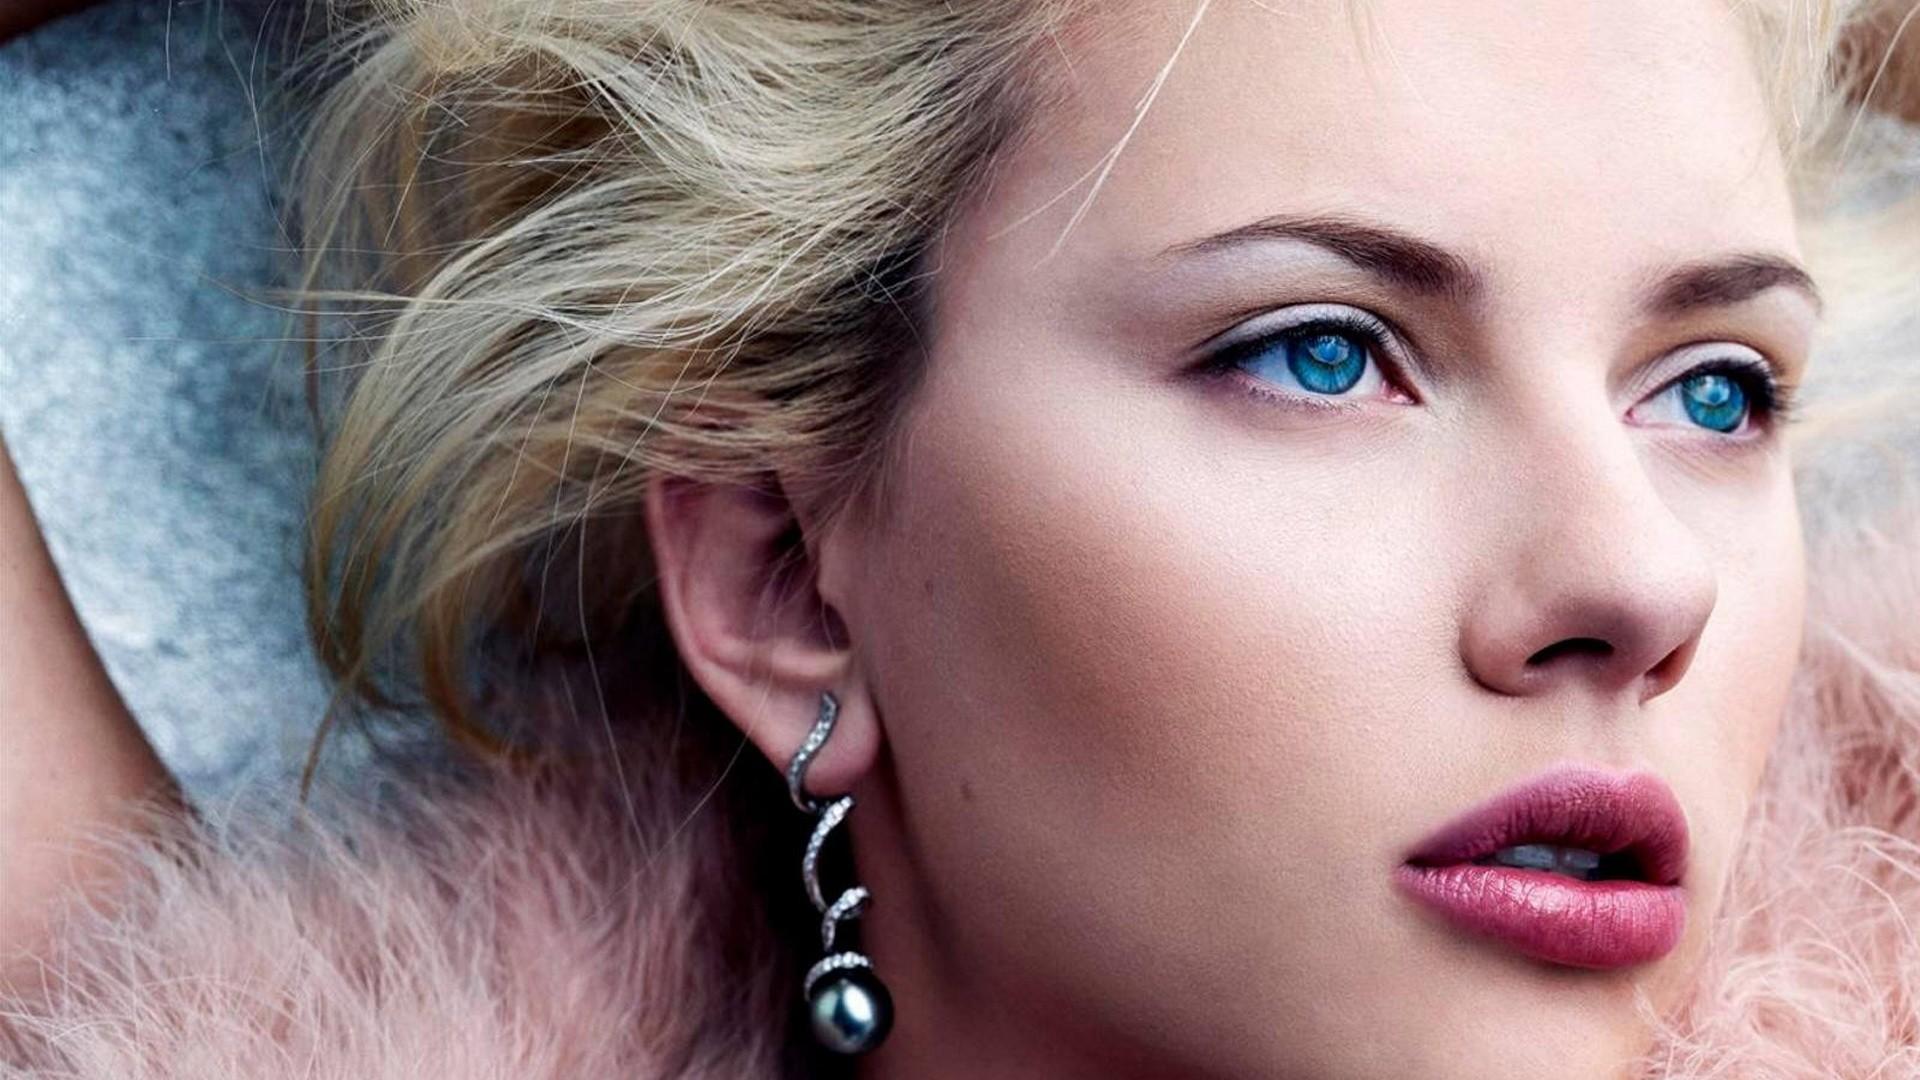 Scarlett Johansson converted wallpapers – 60 Scarlett Johansson wallpapers  – most converted Scarlett Johansson wallpapers